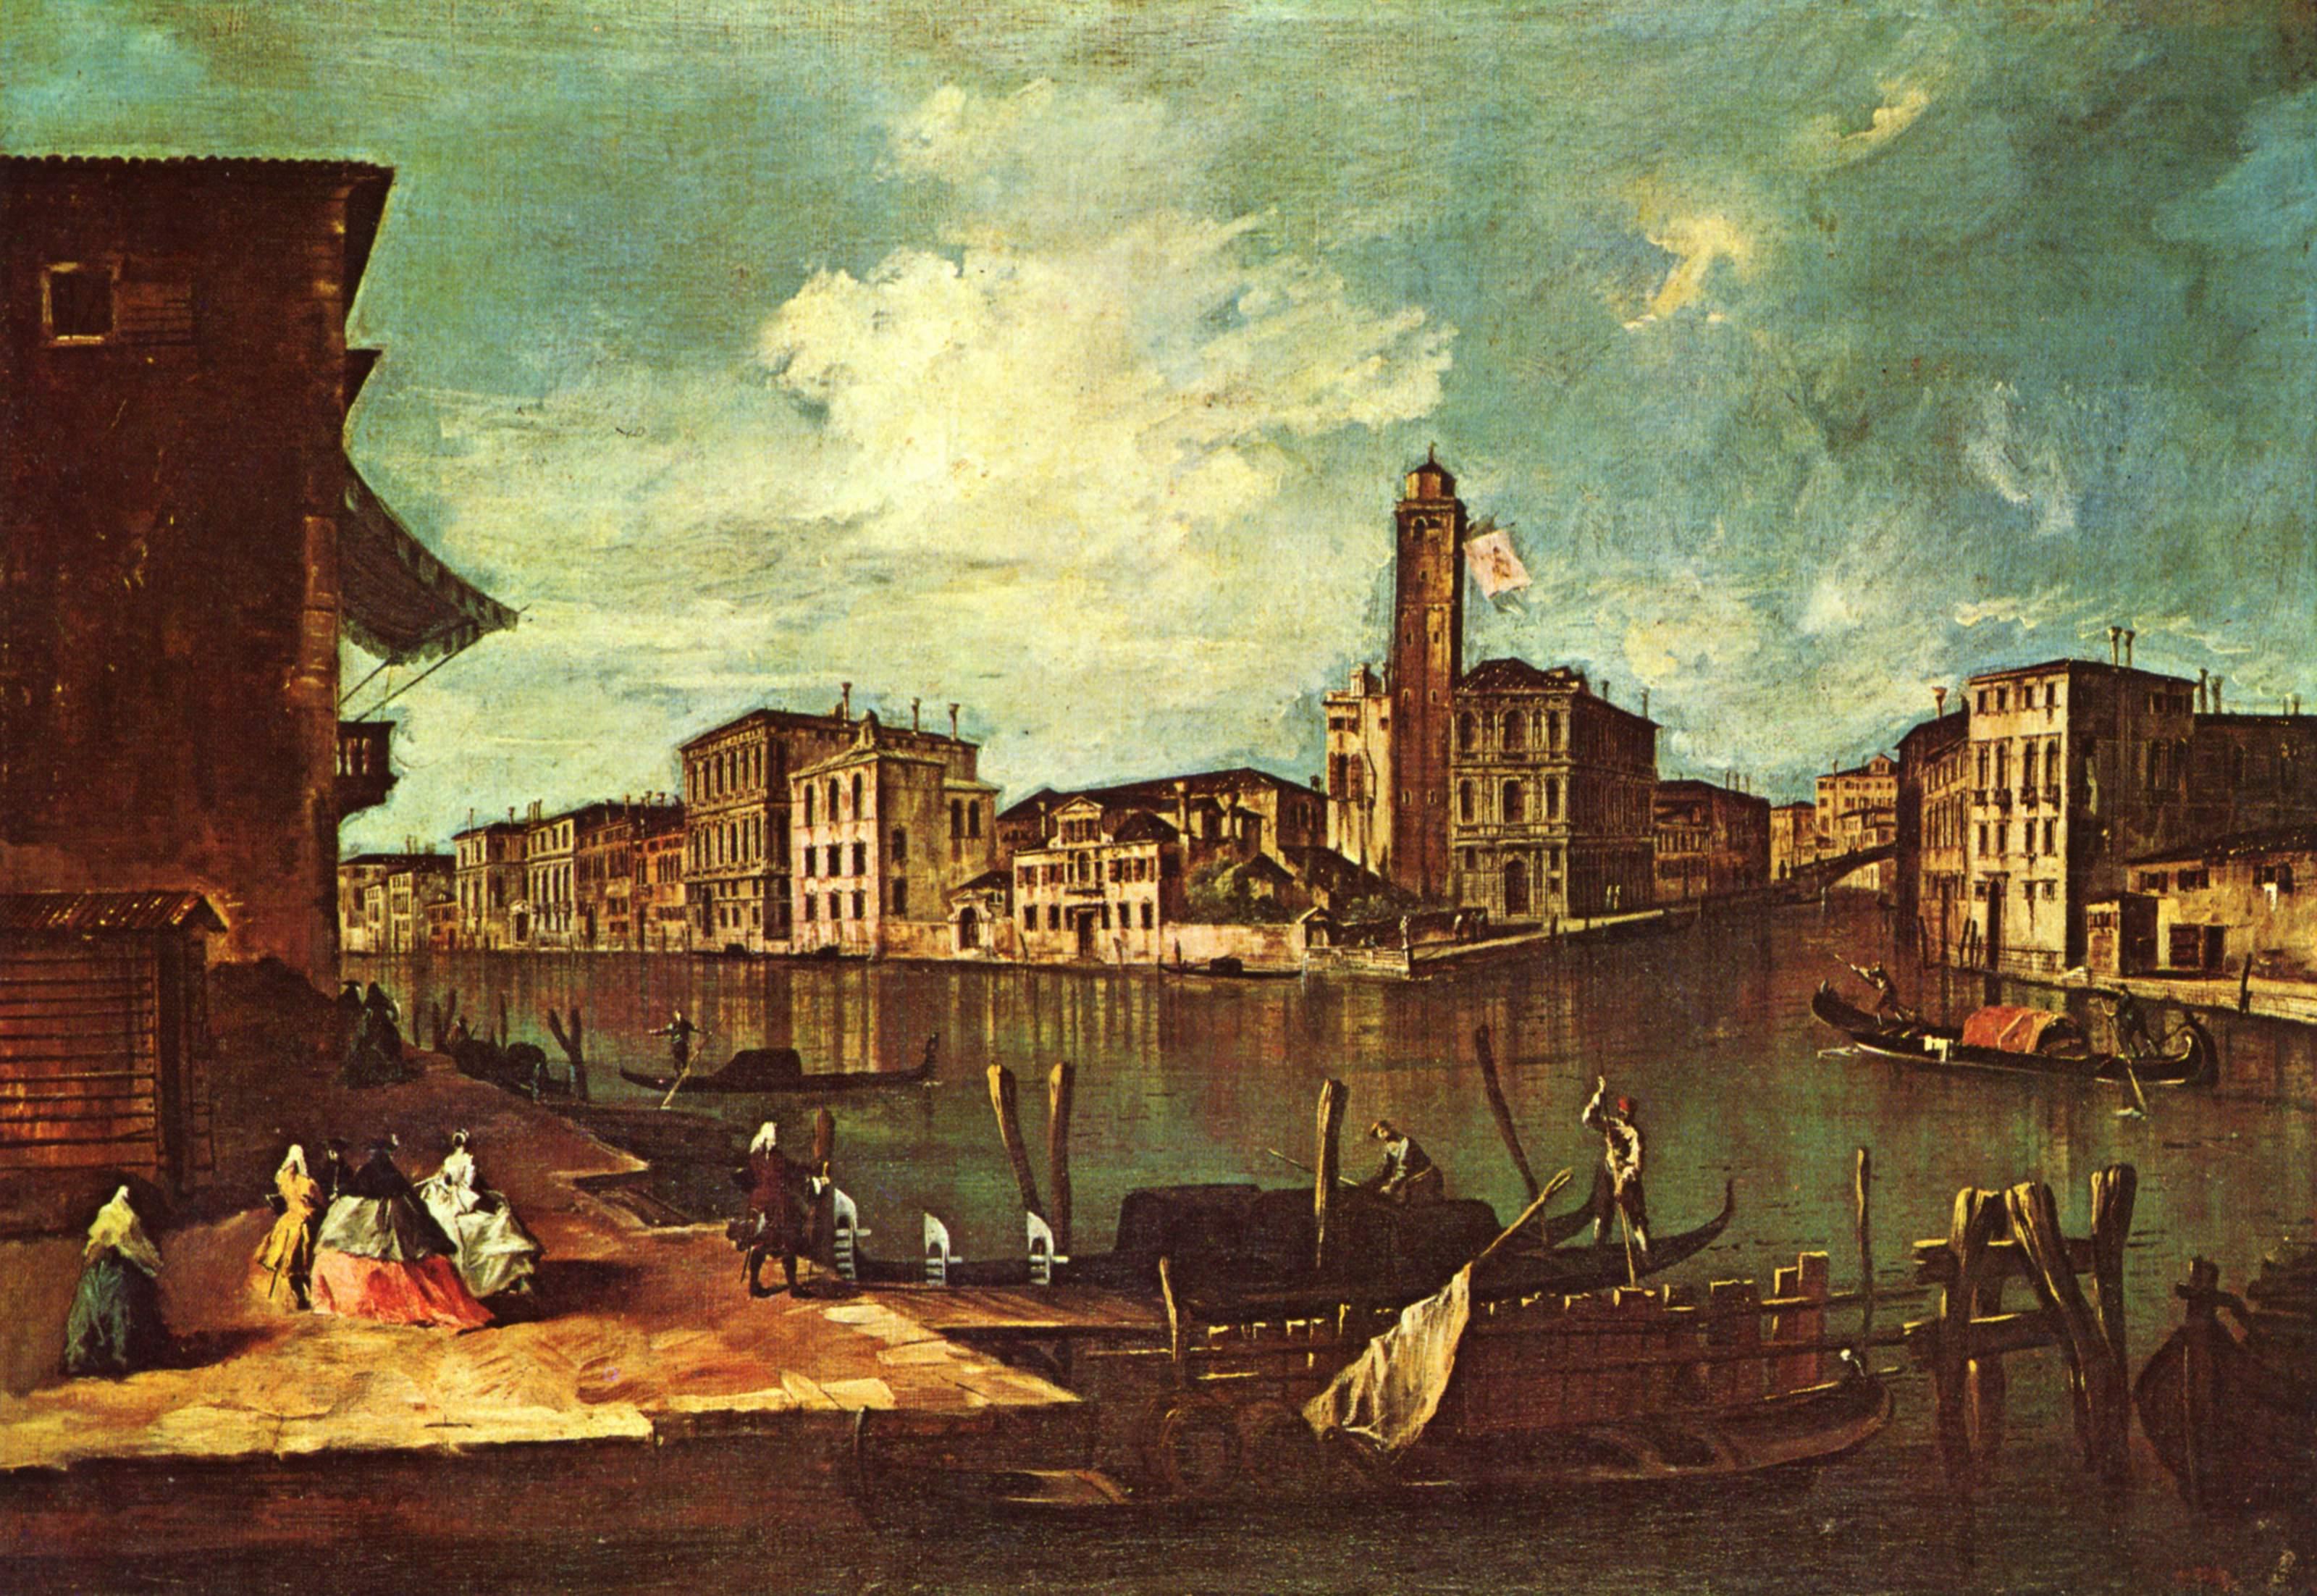 The Grand Canal Venice Francesco Guardi File:francesco Guardi Venice